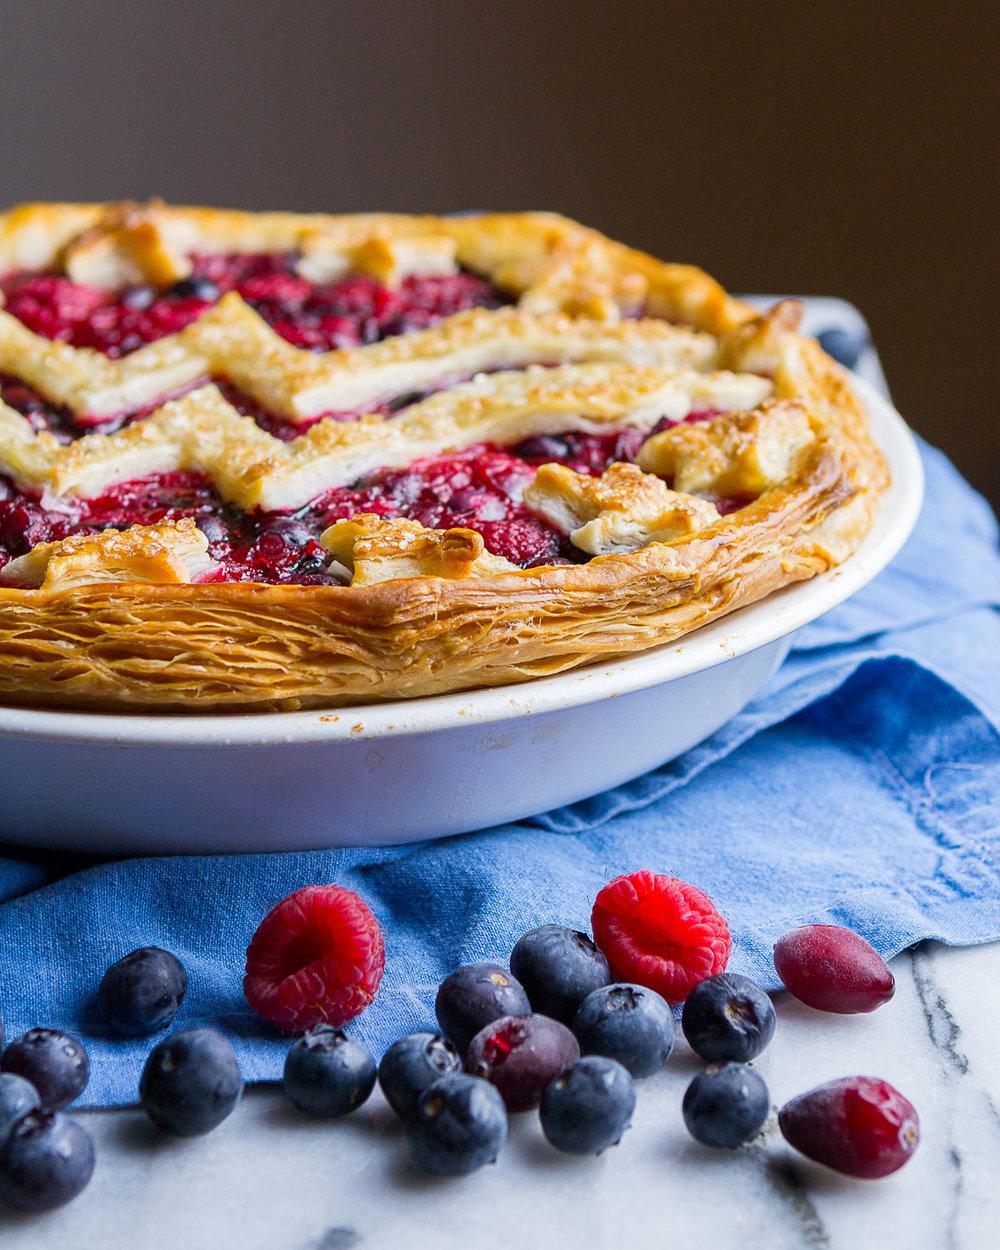 wonder-woman-berry-pie-12.jpg